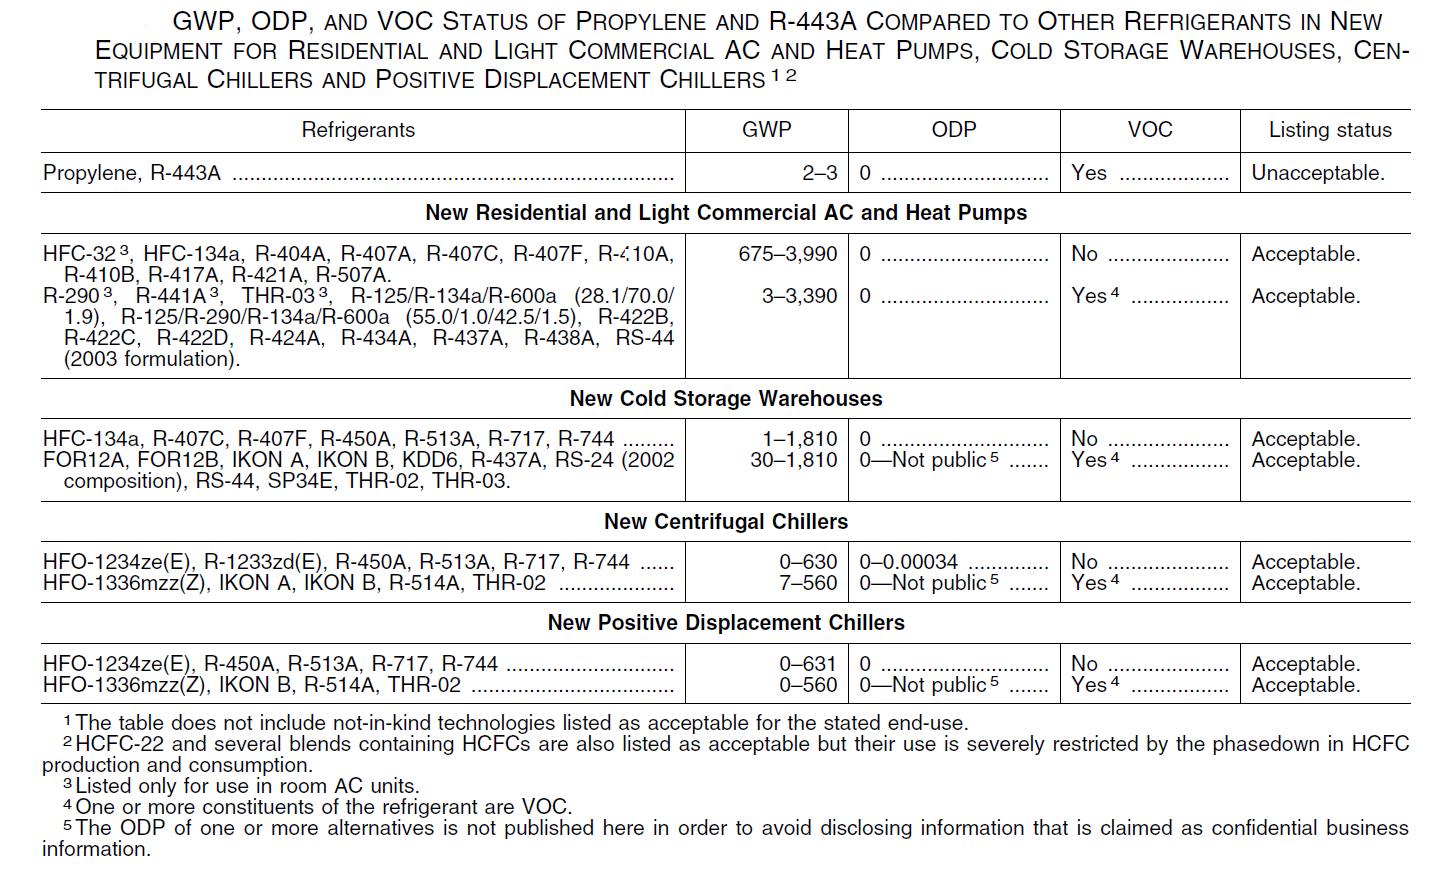 Low GWP Refrigerants - Understanding GWP, GHG, ODP and